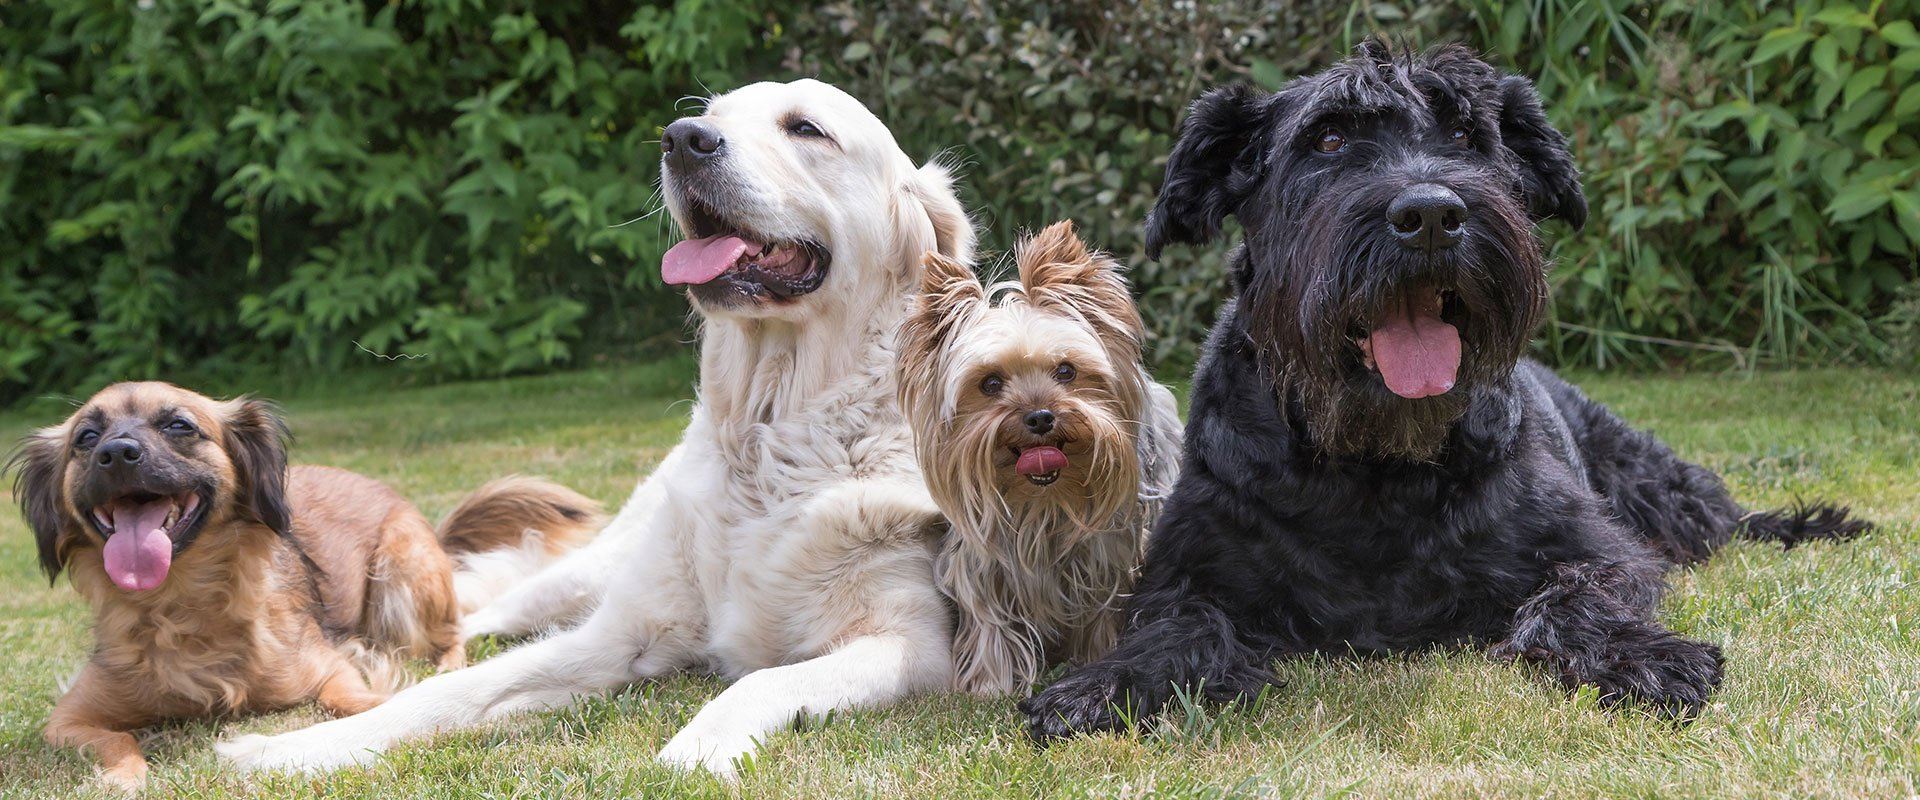 Pet Boarding Lewiston Dog Daycare Fur Family Cinema